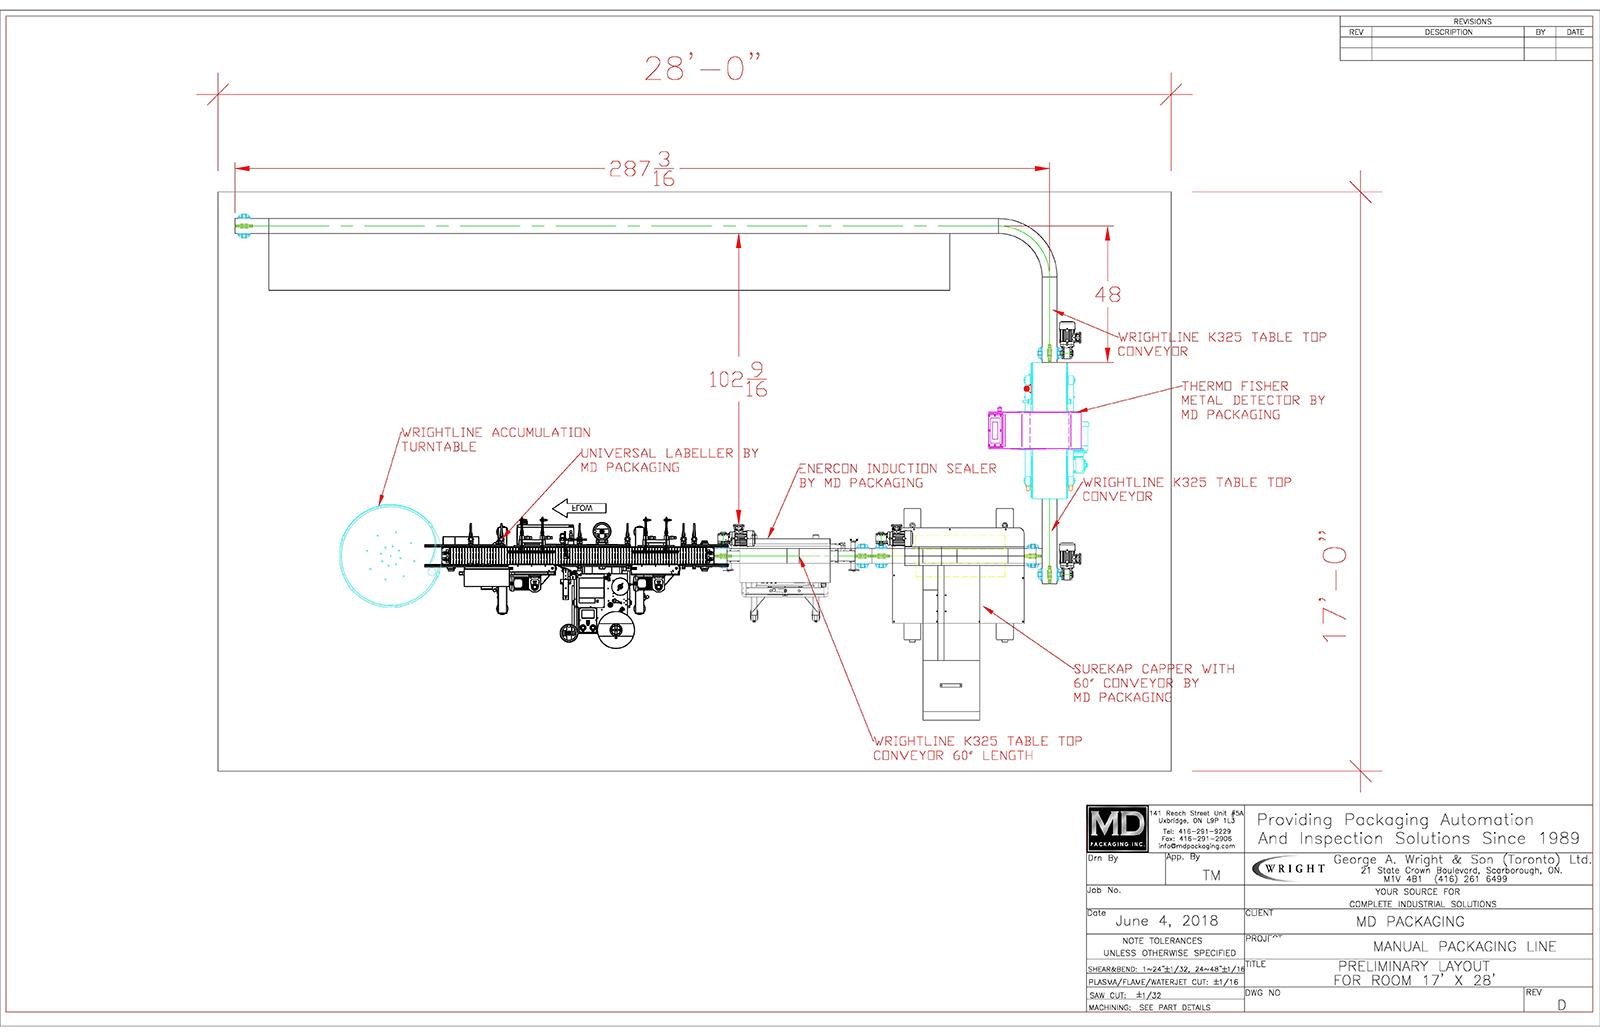 resized_1-gaw-180604-md-cann-trust-manual-line-revd-dsize